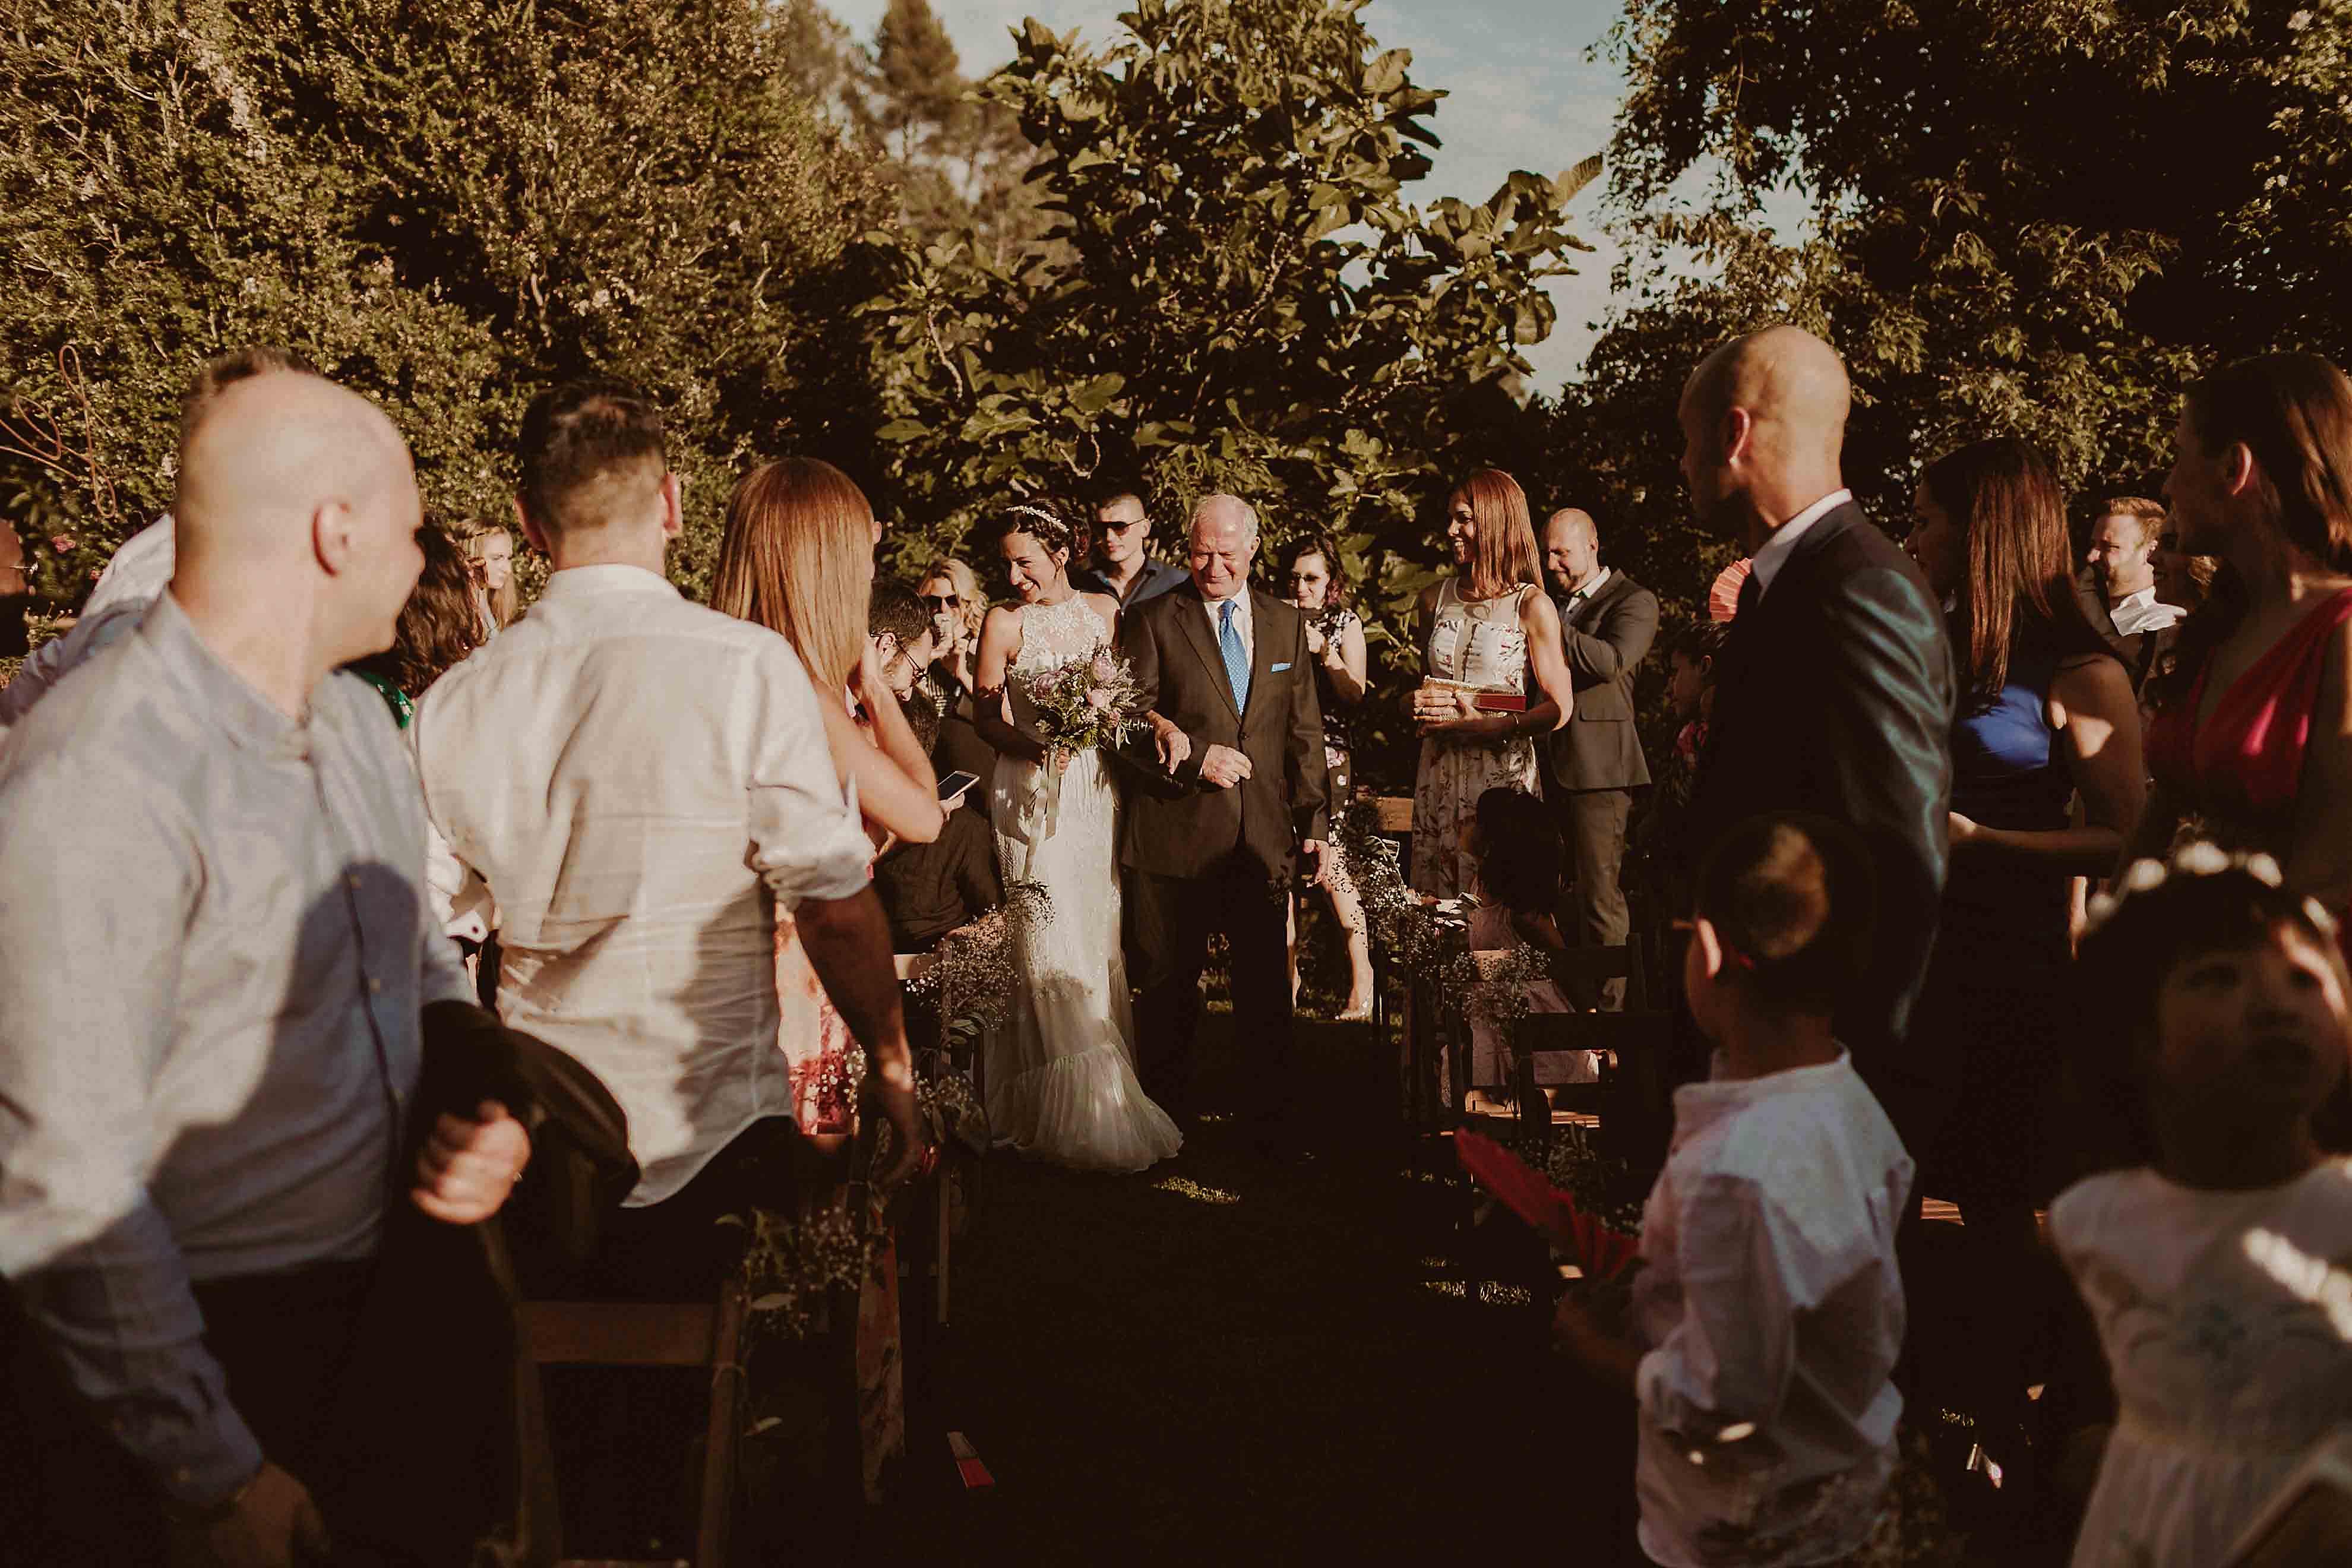 Boda rústica en la montaña. fotgrafo de bodas barcelona_049